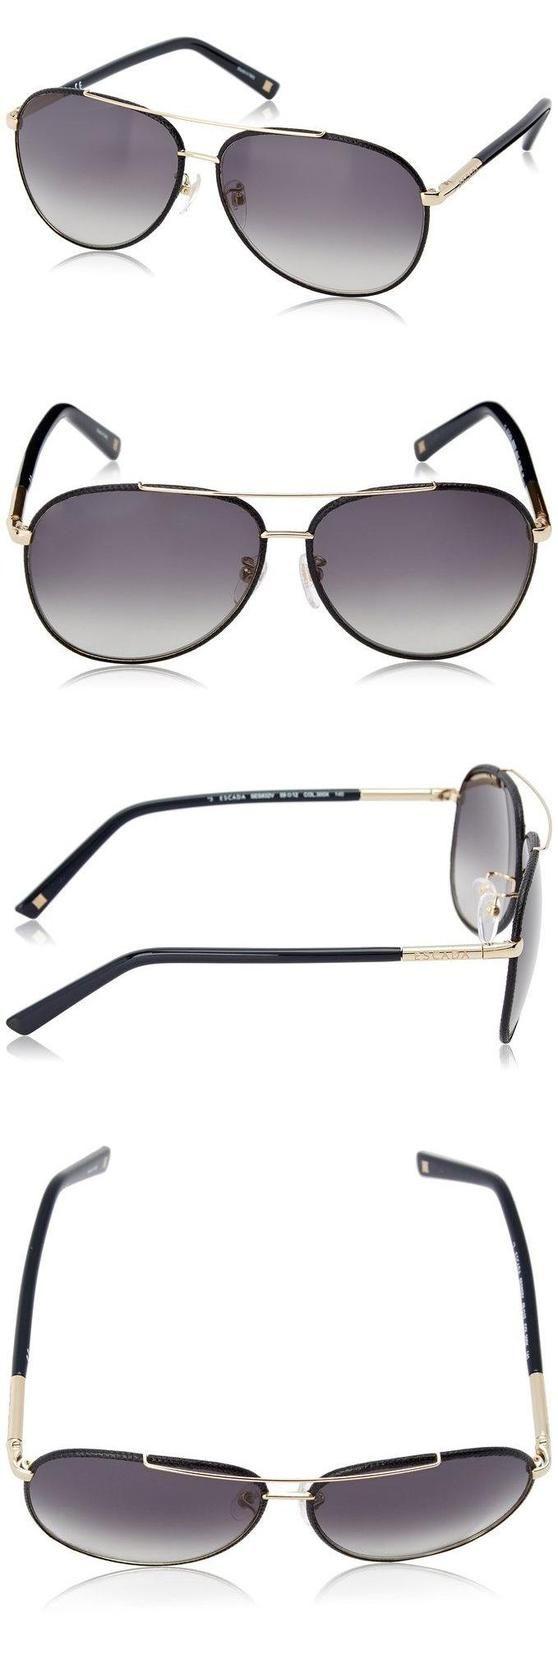 90cc8f0bc0f  325 - Escada Sunglasses Women s SES832V-300X Aviator Sunglasses ...